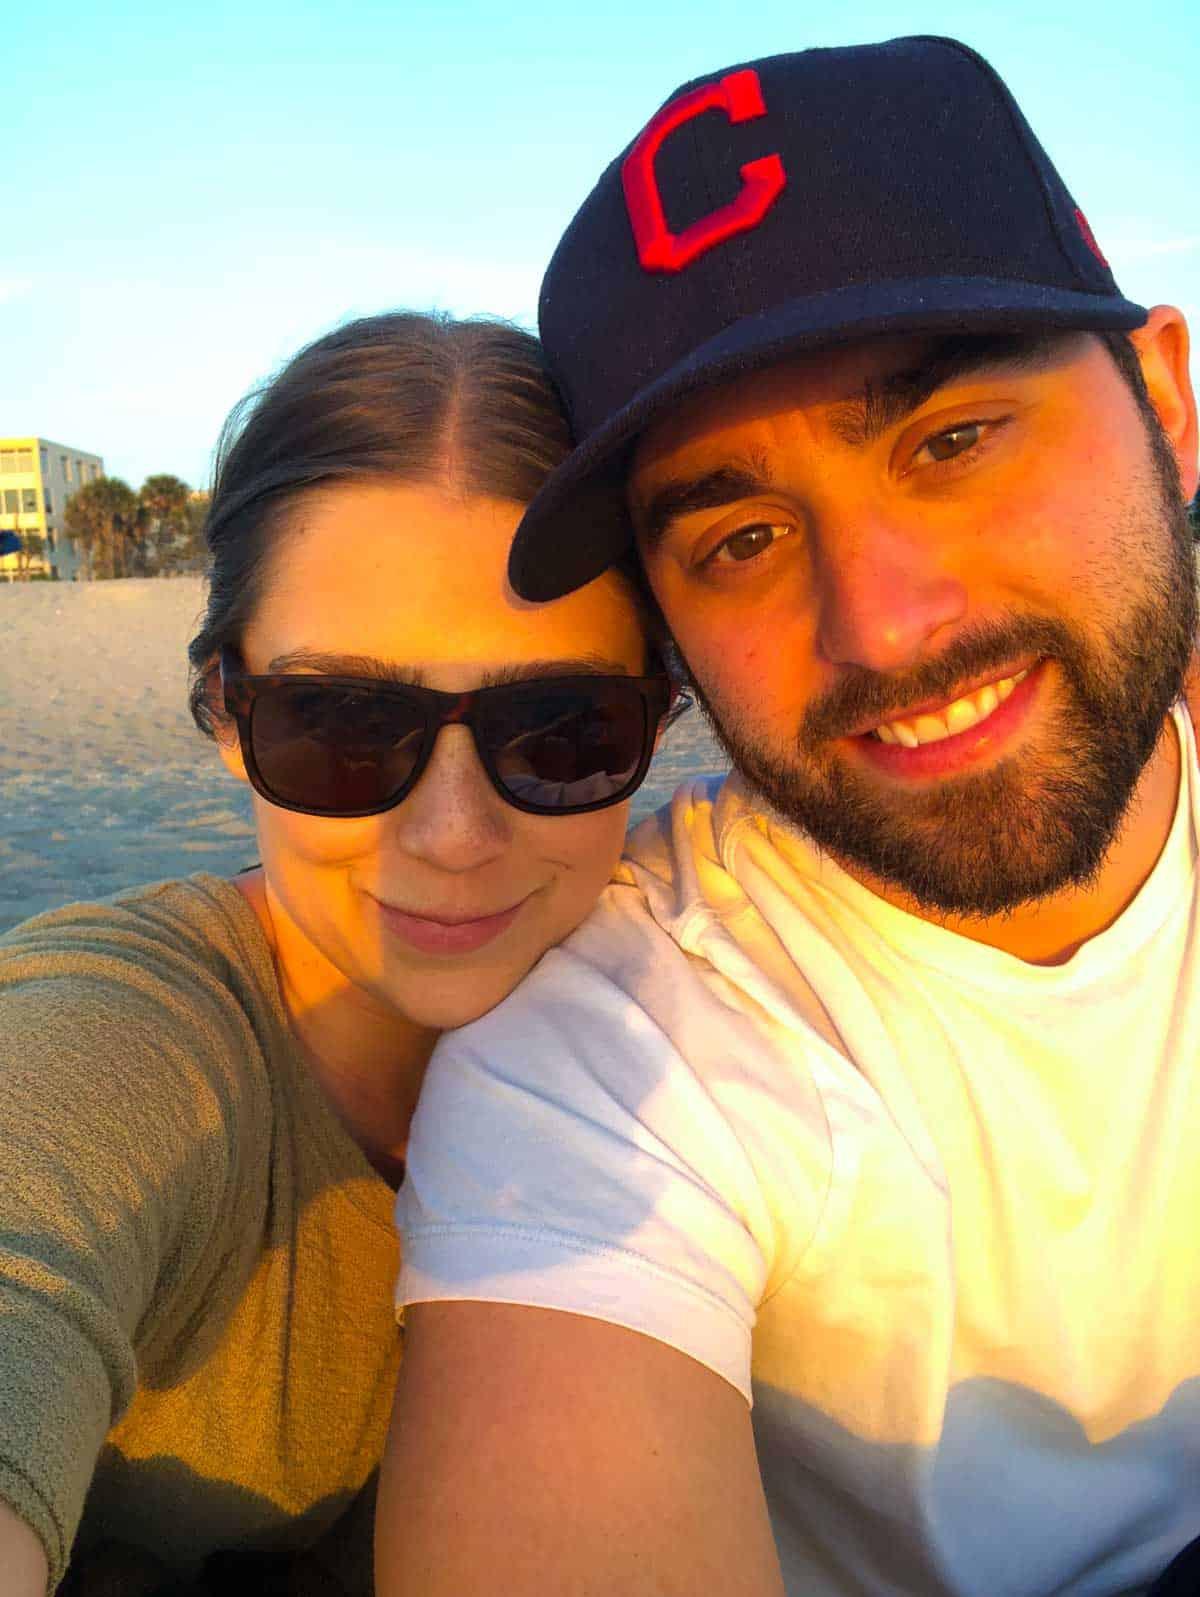 Kara and Steve on the beach in Florida